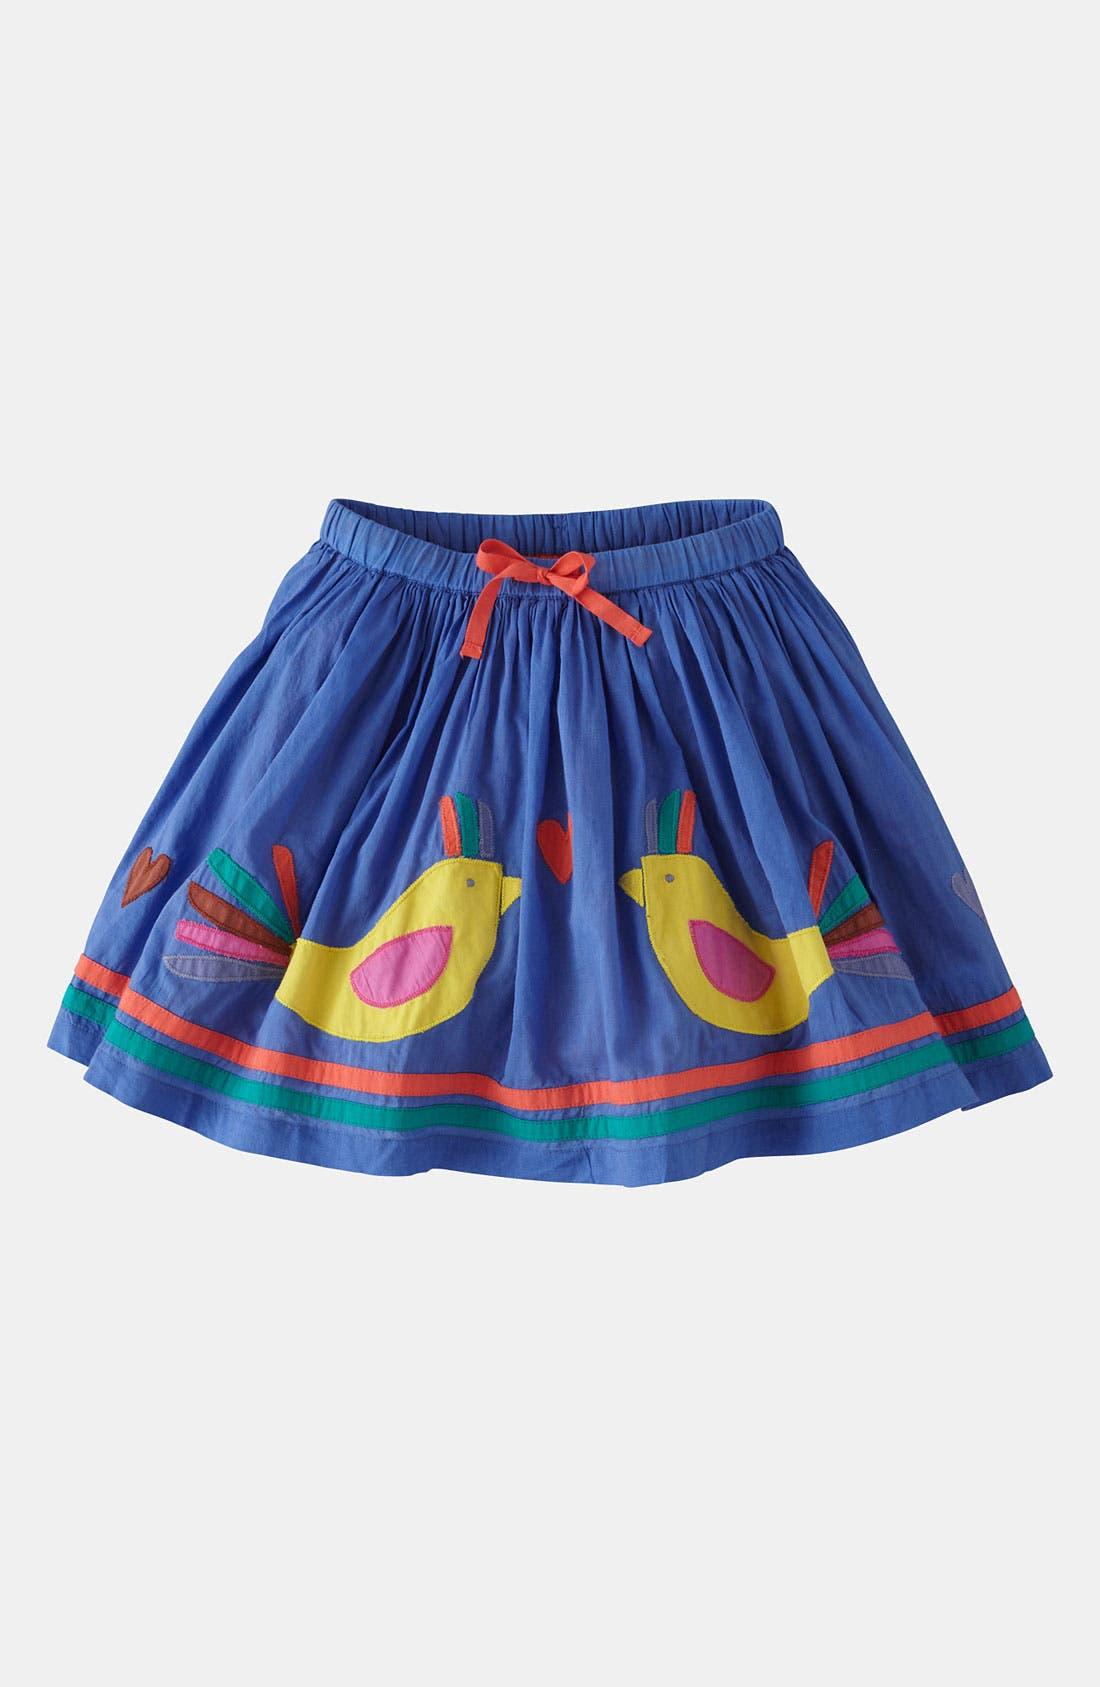 Main Image - Mini Boden 'Decorative' Skirt (Little Girls & Big Girls)